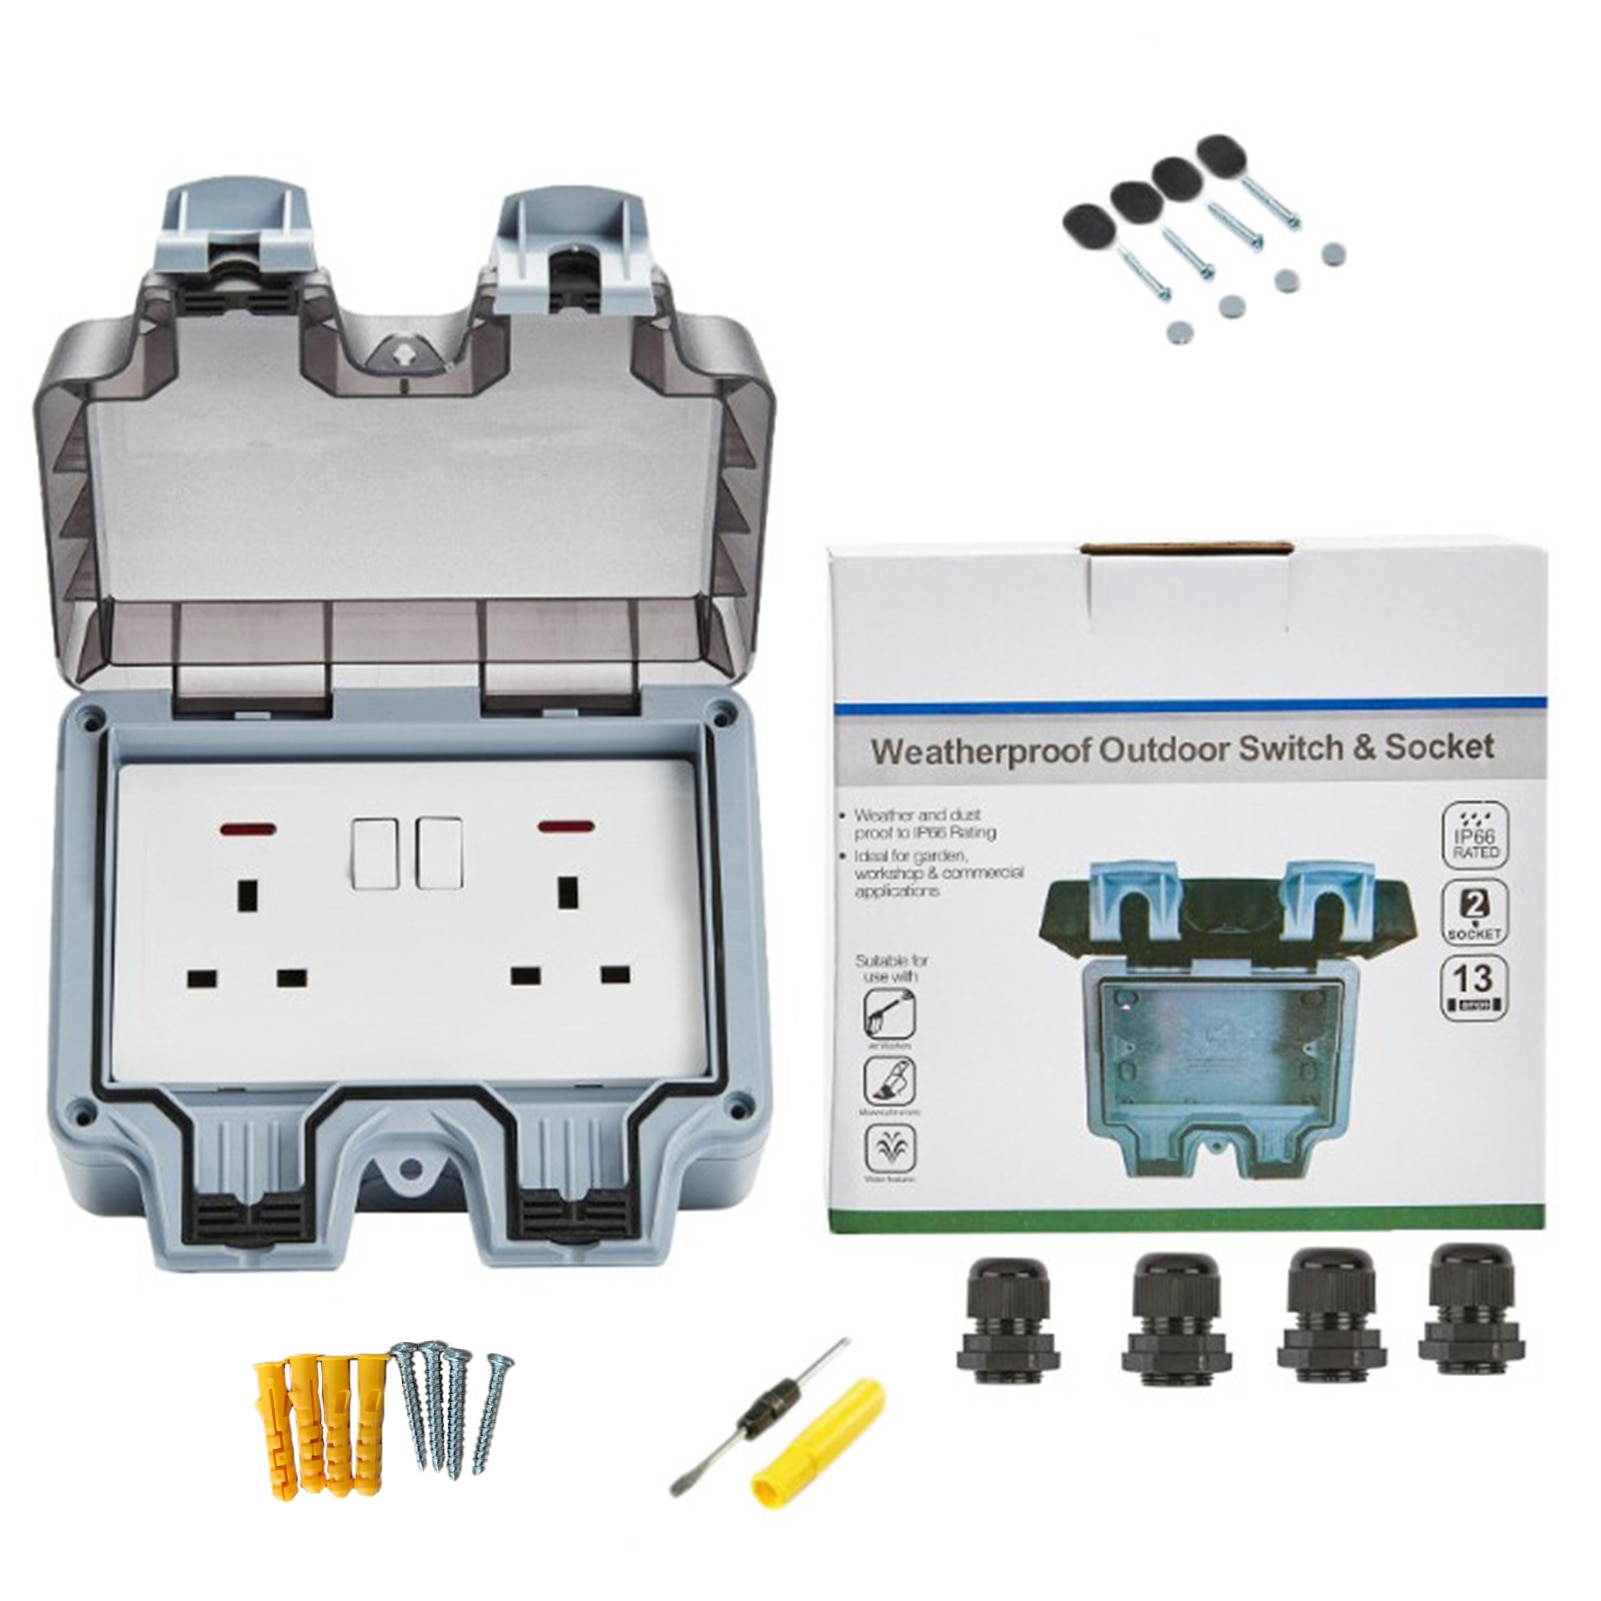 220V-250V Waterproof Socket IP66 Dust-proof UK Regulation Outlet Indoor Wall Power Socket For Outdoor Garden Garage